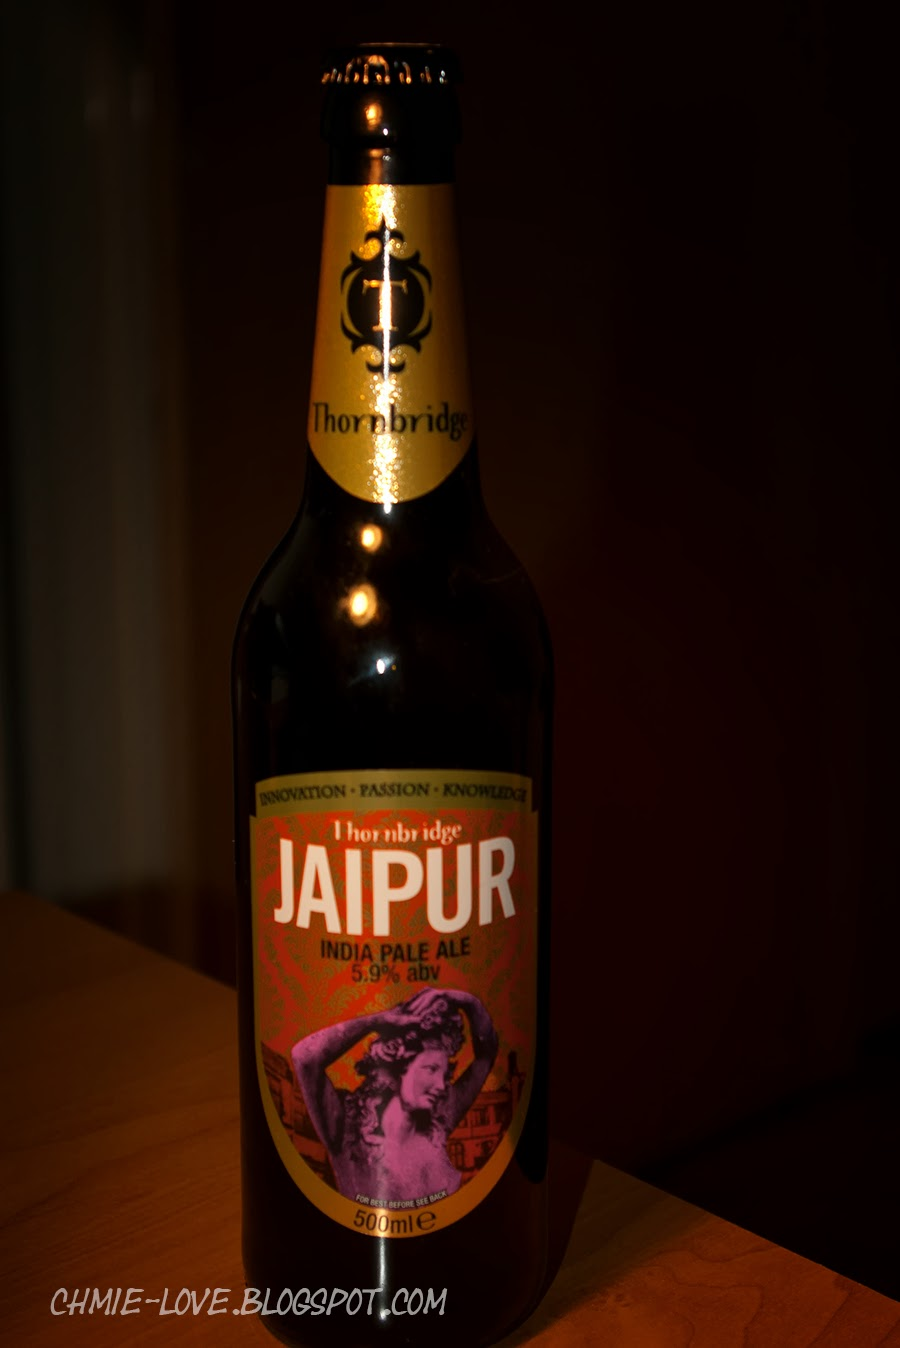 Browar Thrnbridge, india pale ale Jaipur